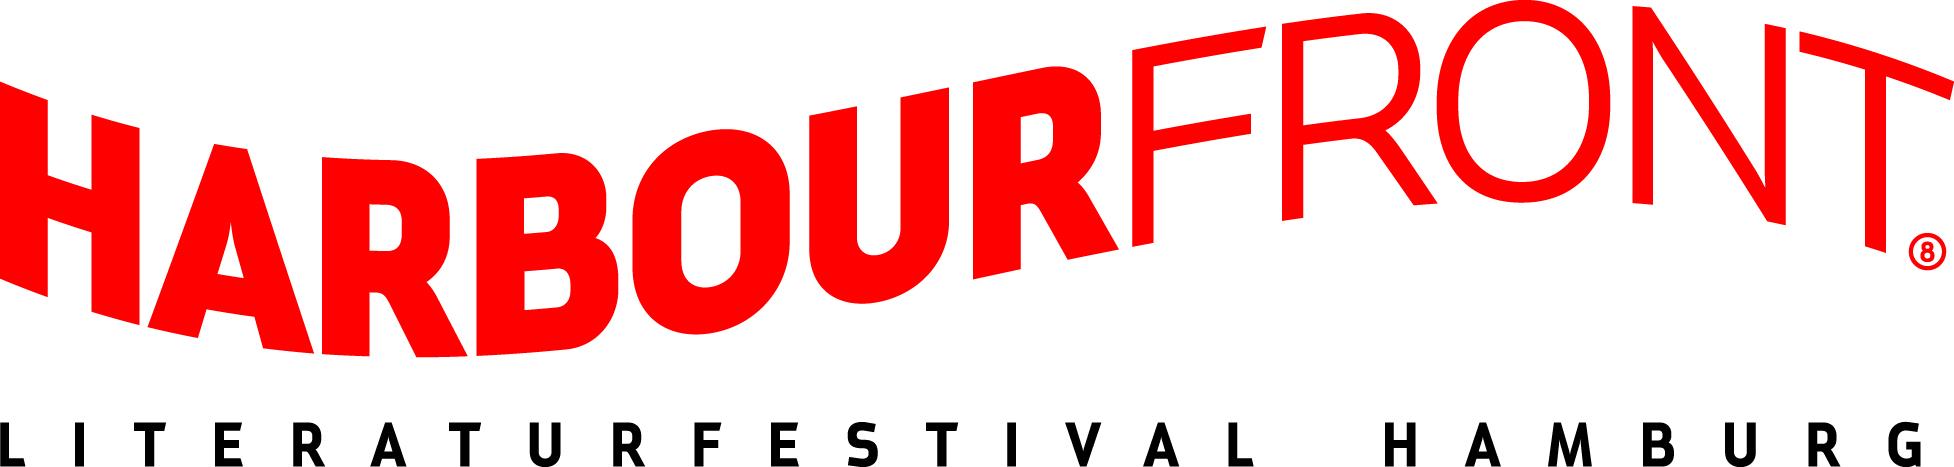 Harbourfront Literaturfestival Hamburg 2017